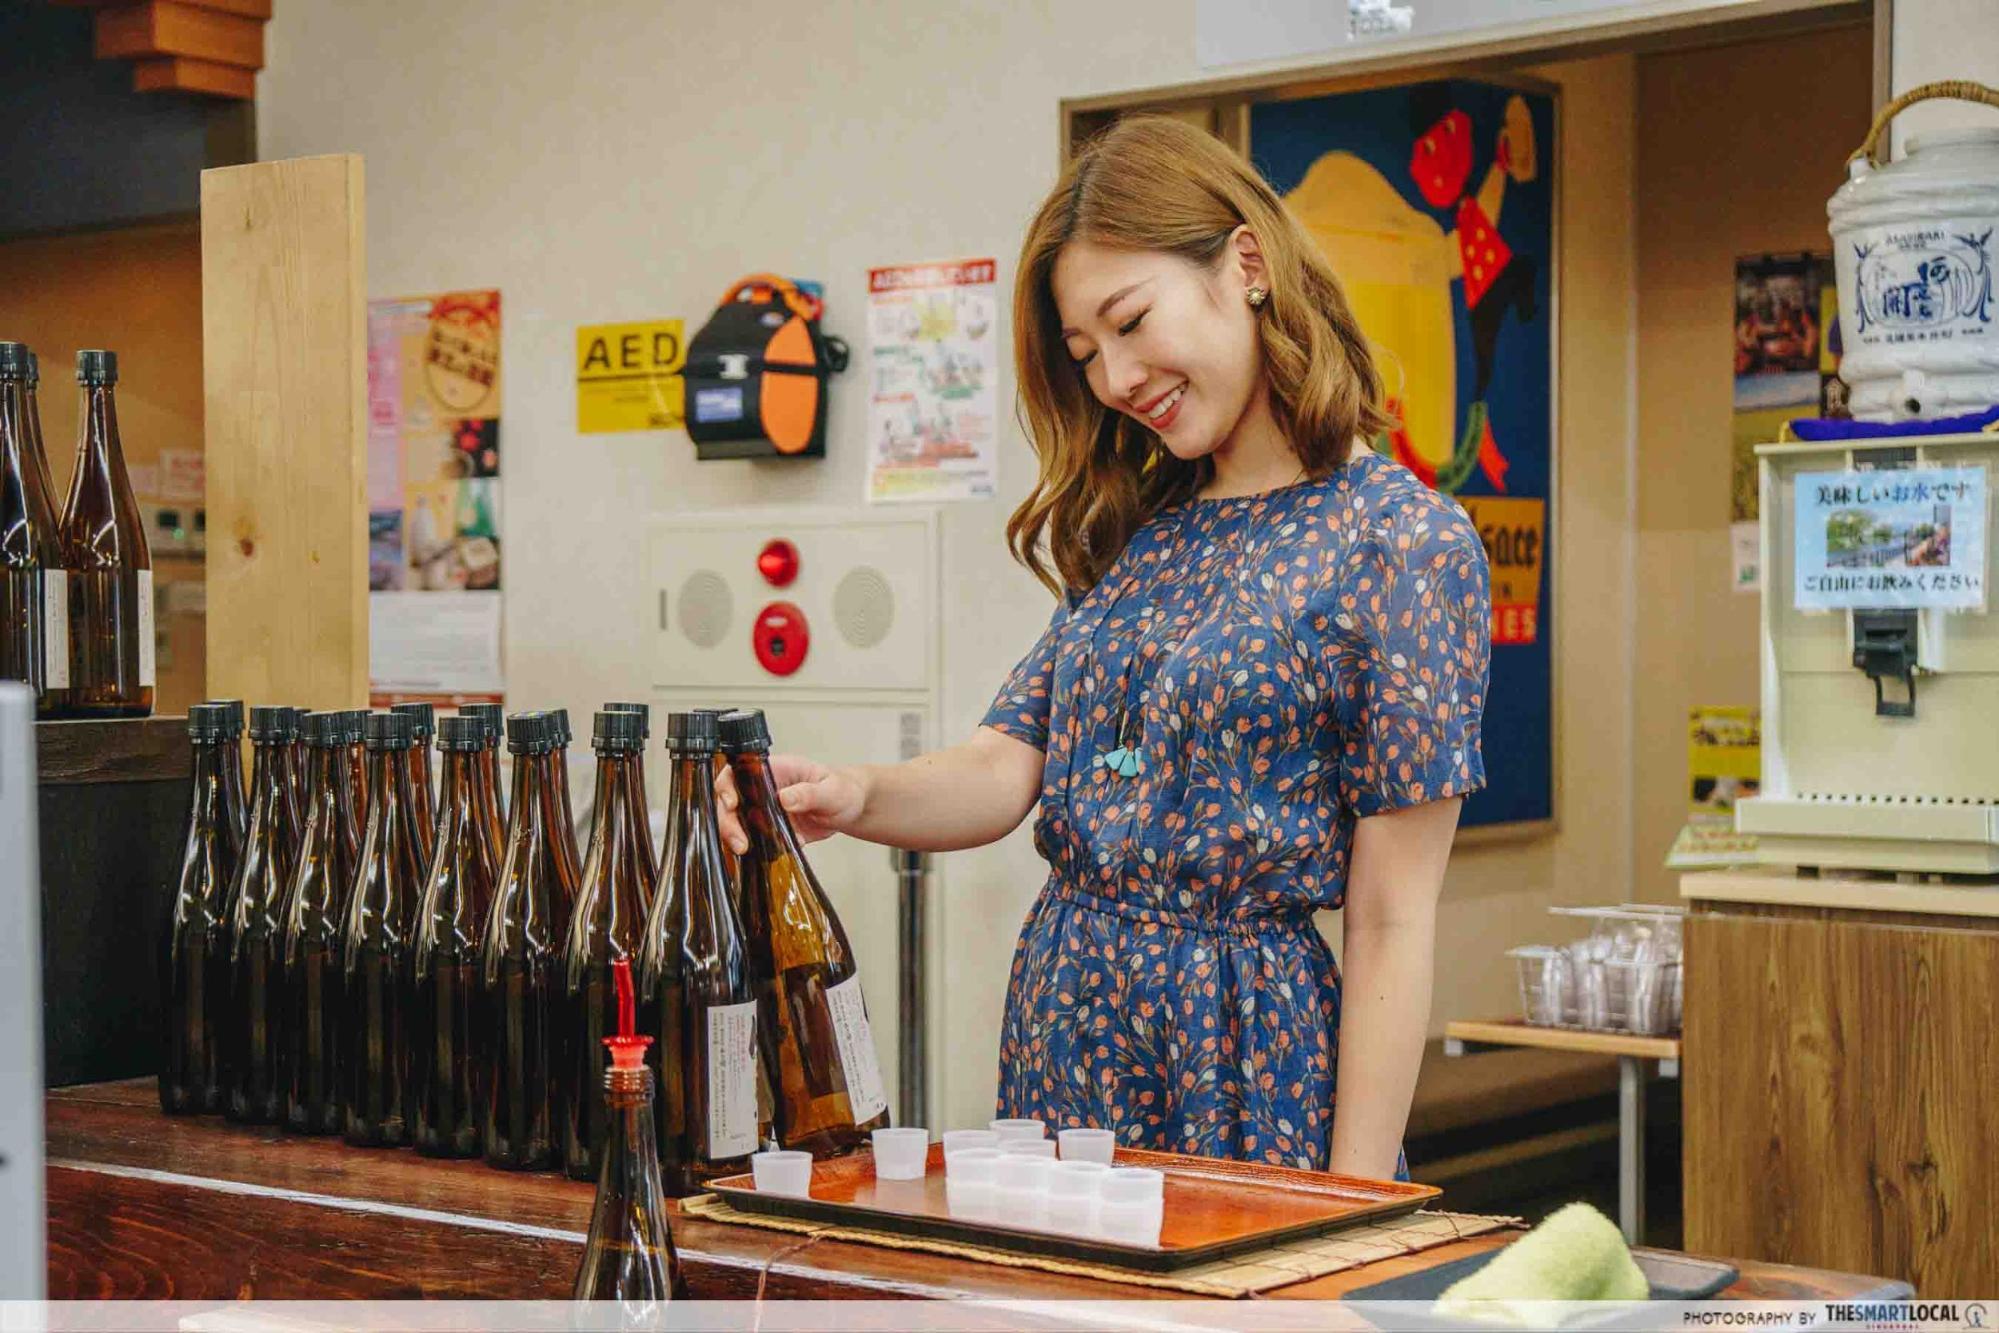 Tohoku Japan - Asabiraki Sake Brewery